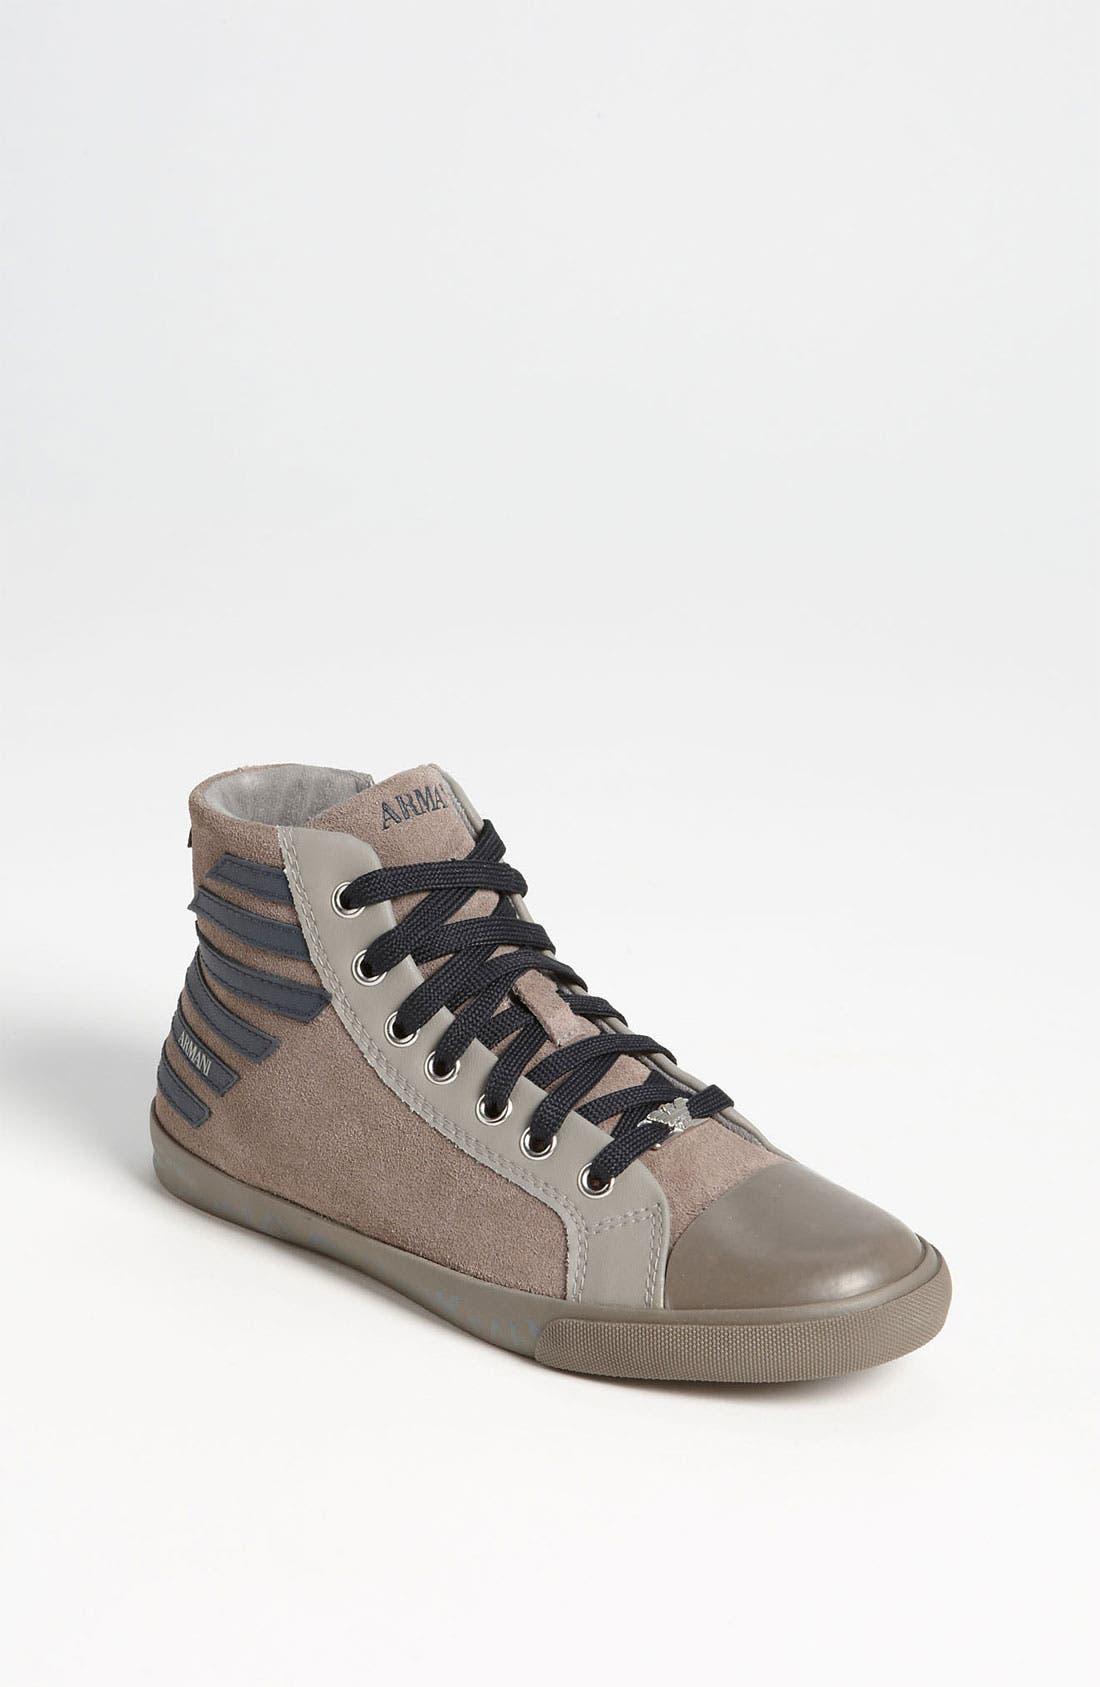 Alternate Image 1 Selected - Armani Junior 'Eagle' Sneaker (Toddler, Little Kid & Big Kid)